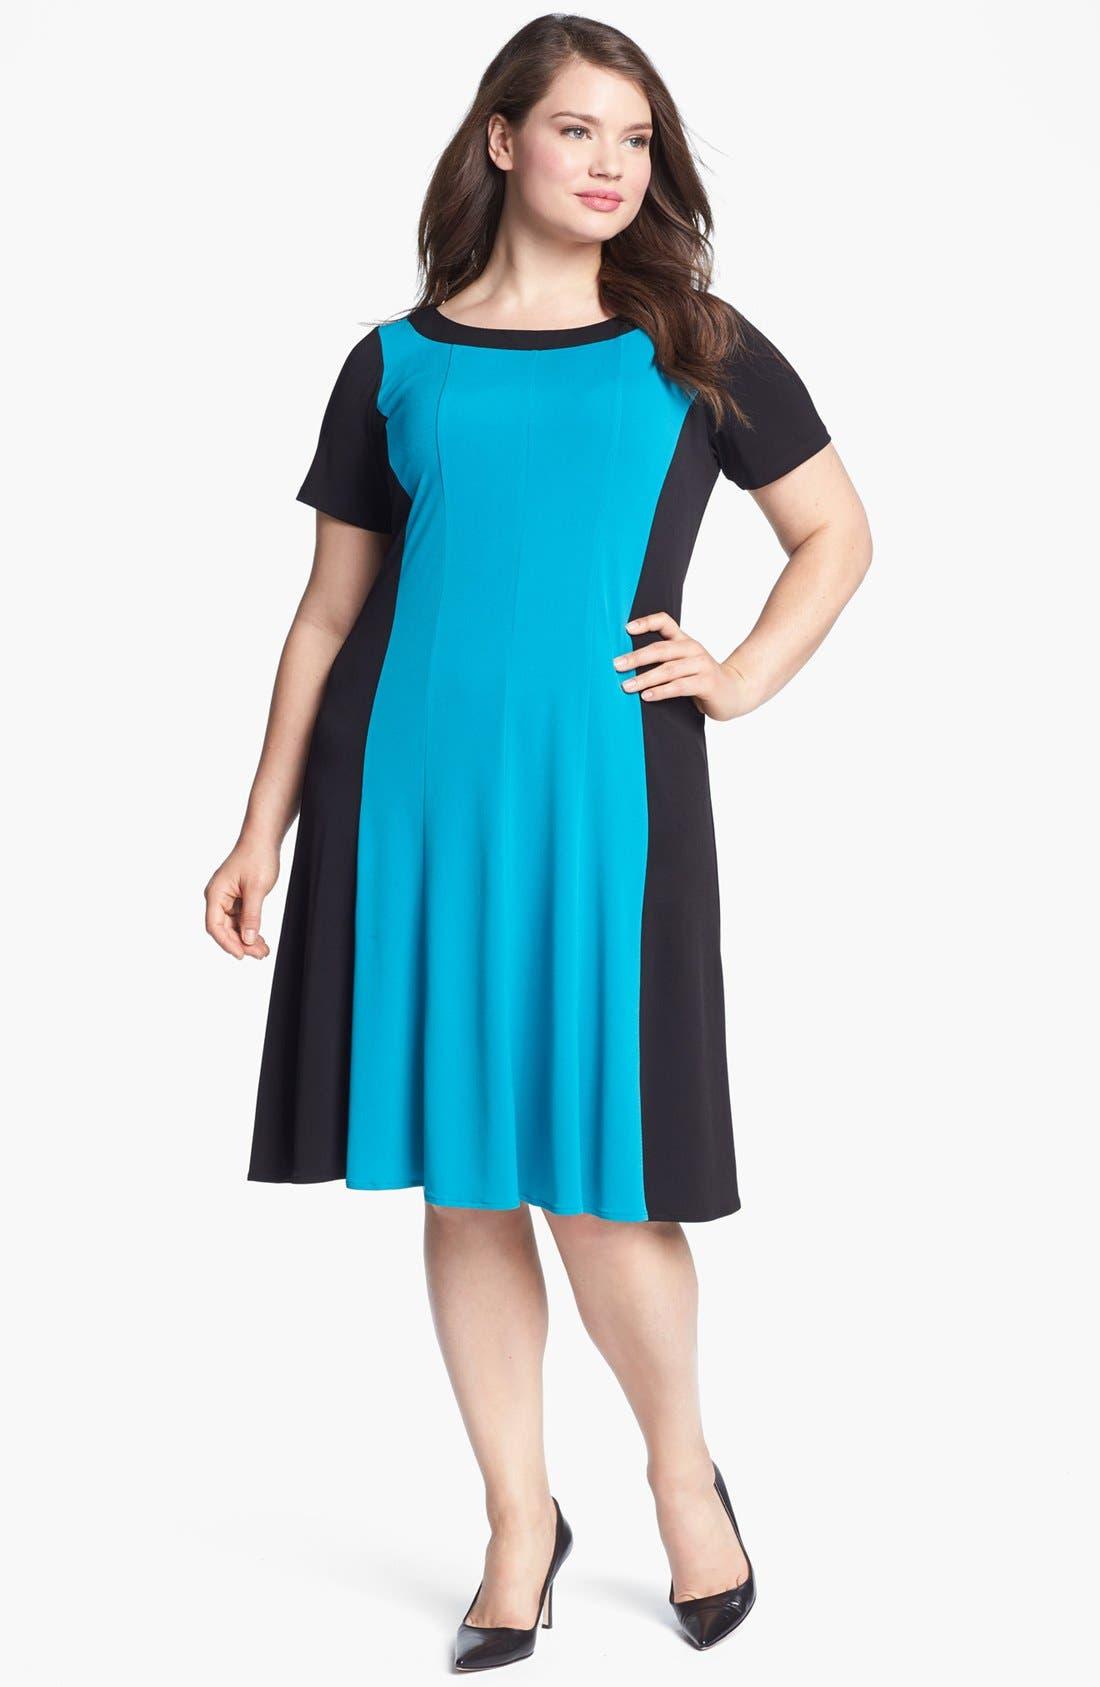 Alternate Image 1 Selected - London Times Colorblock Matte Jersey Dress (Plus Size)